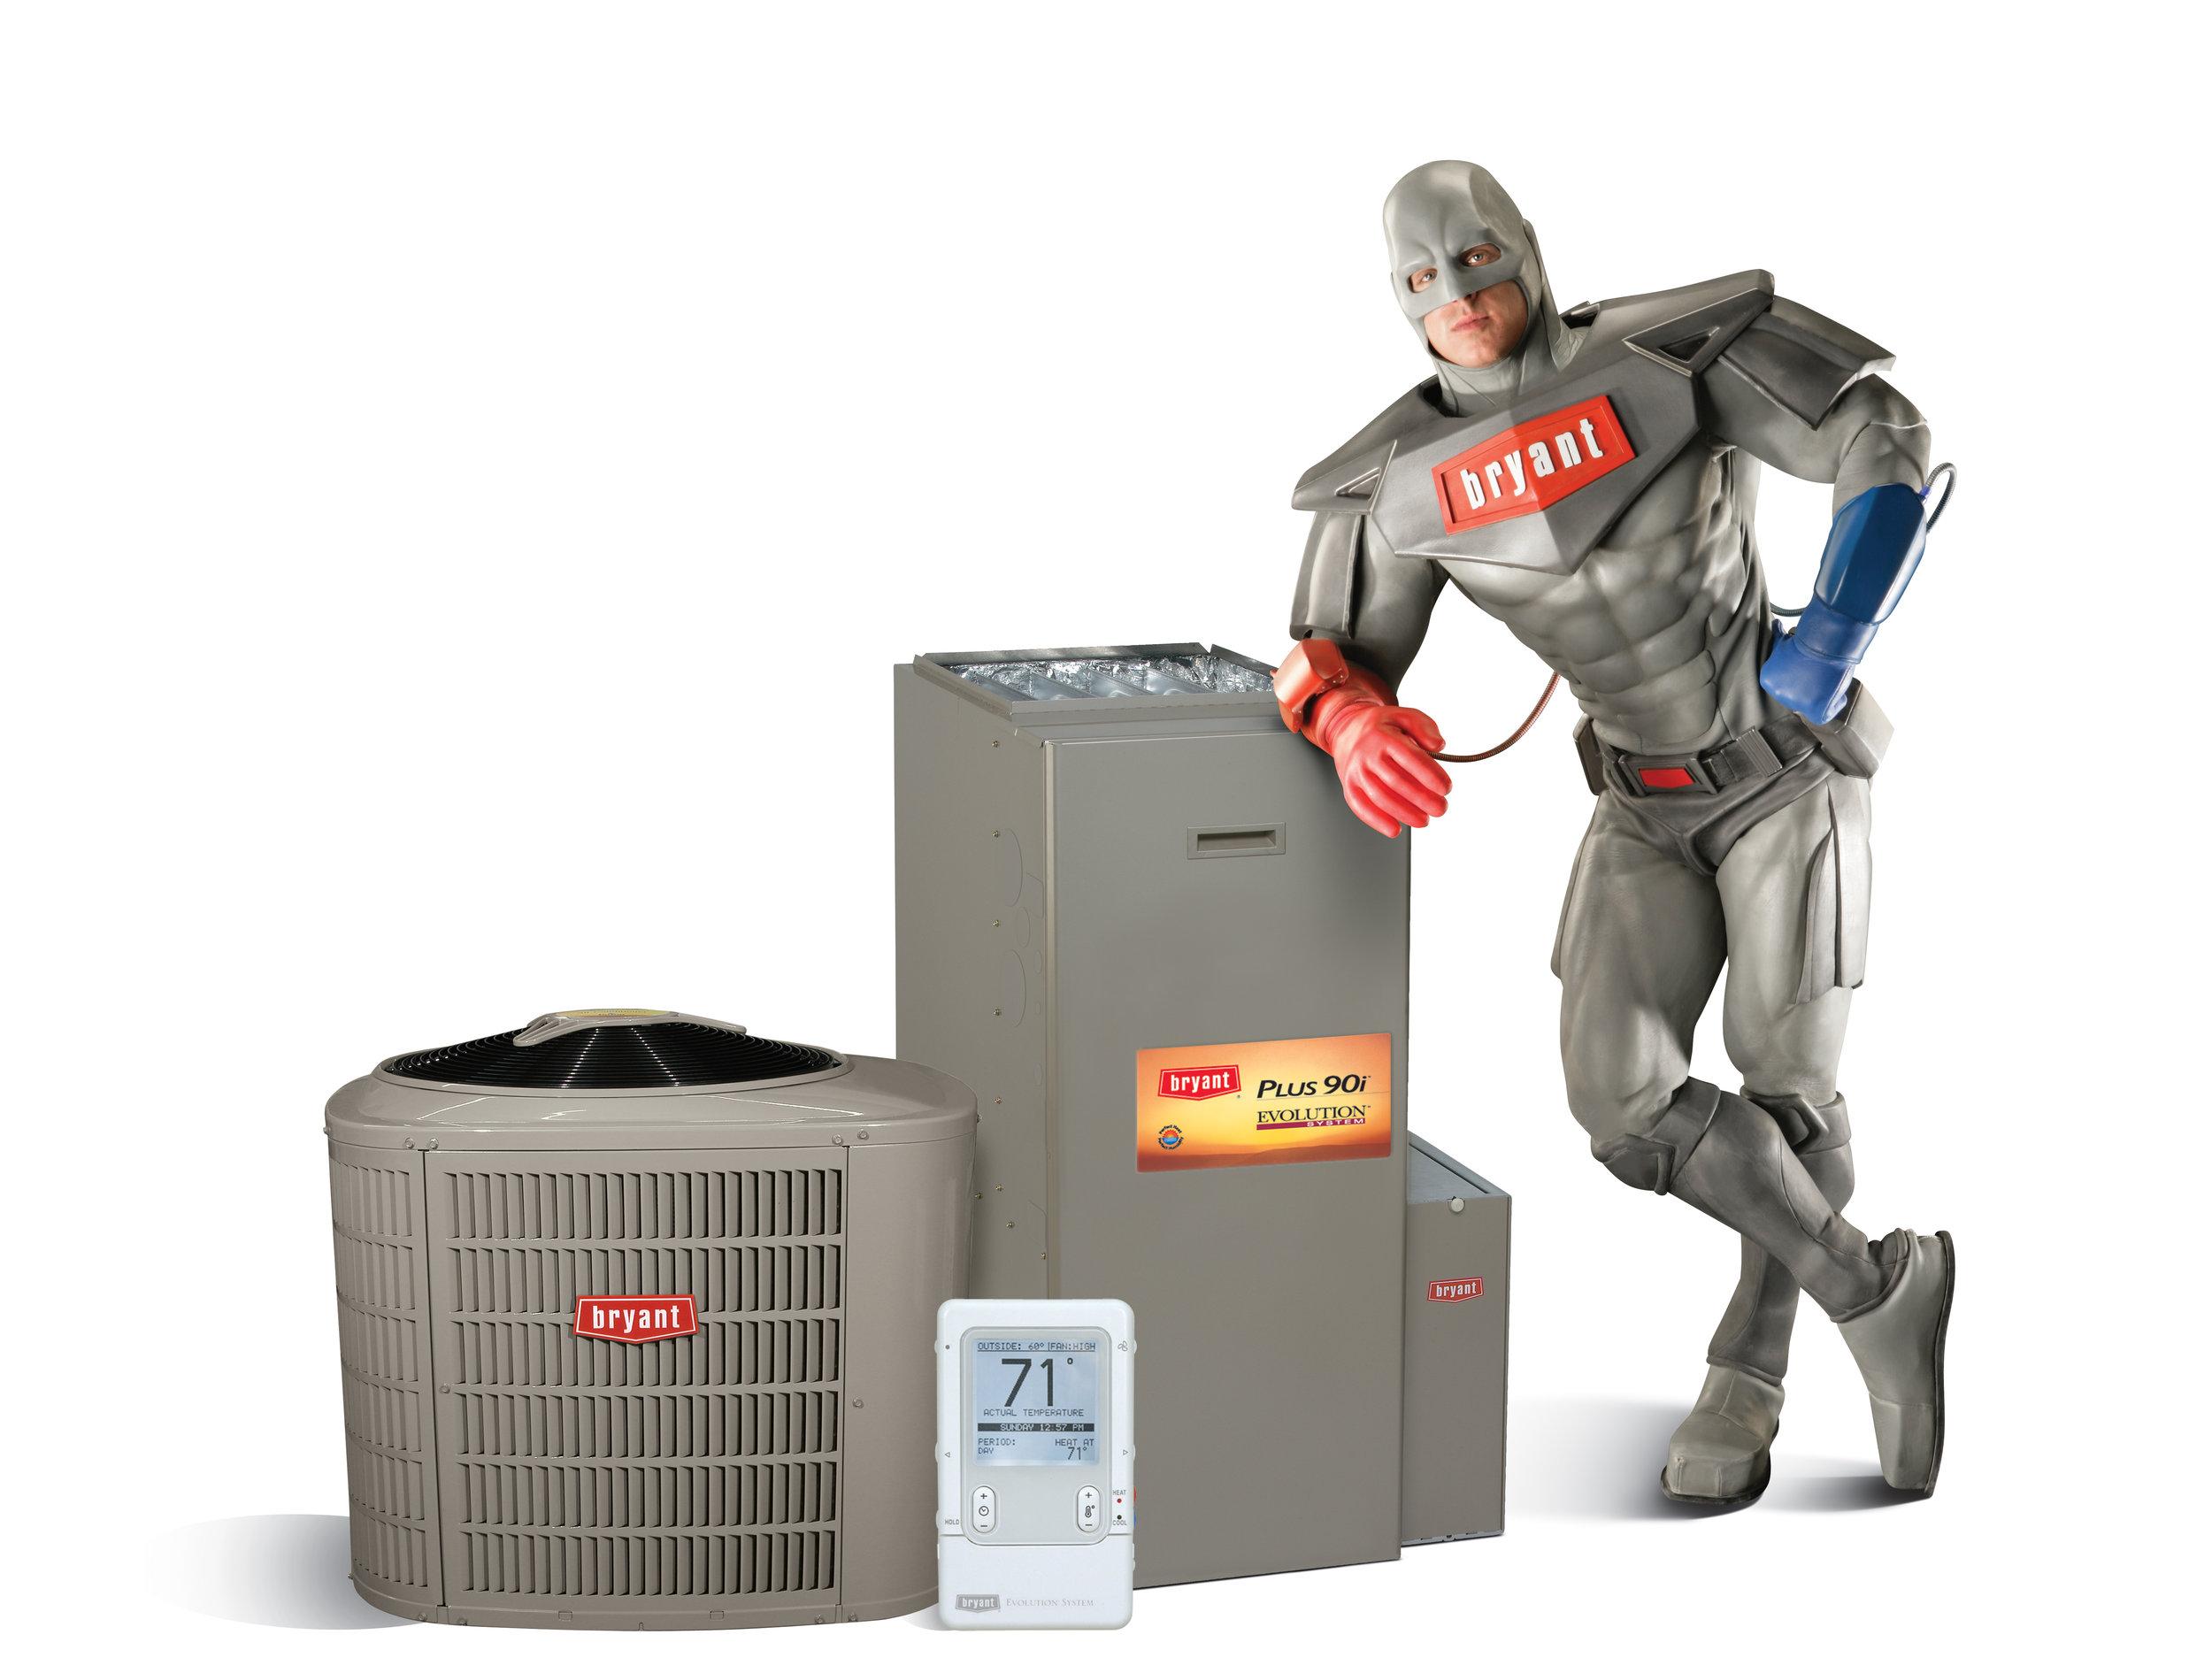 Bryantman_Grouping_Evol90i.jpg. furnace-burners-300x229.jpg. Air  Conditioning Repair ...